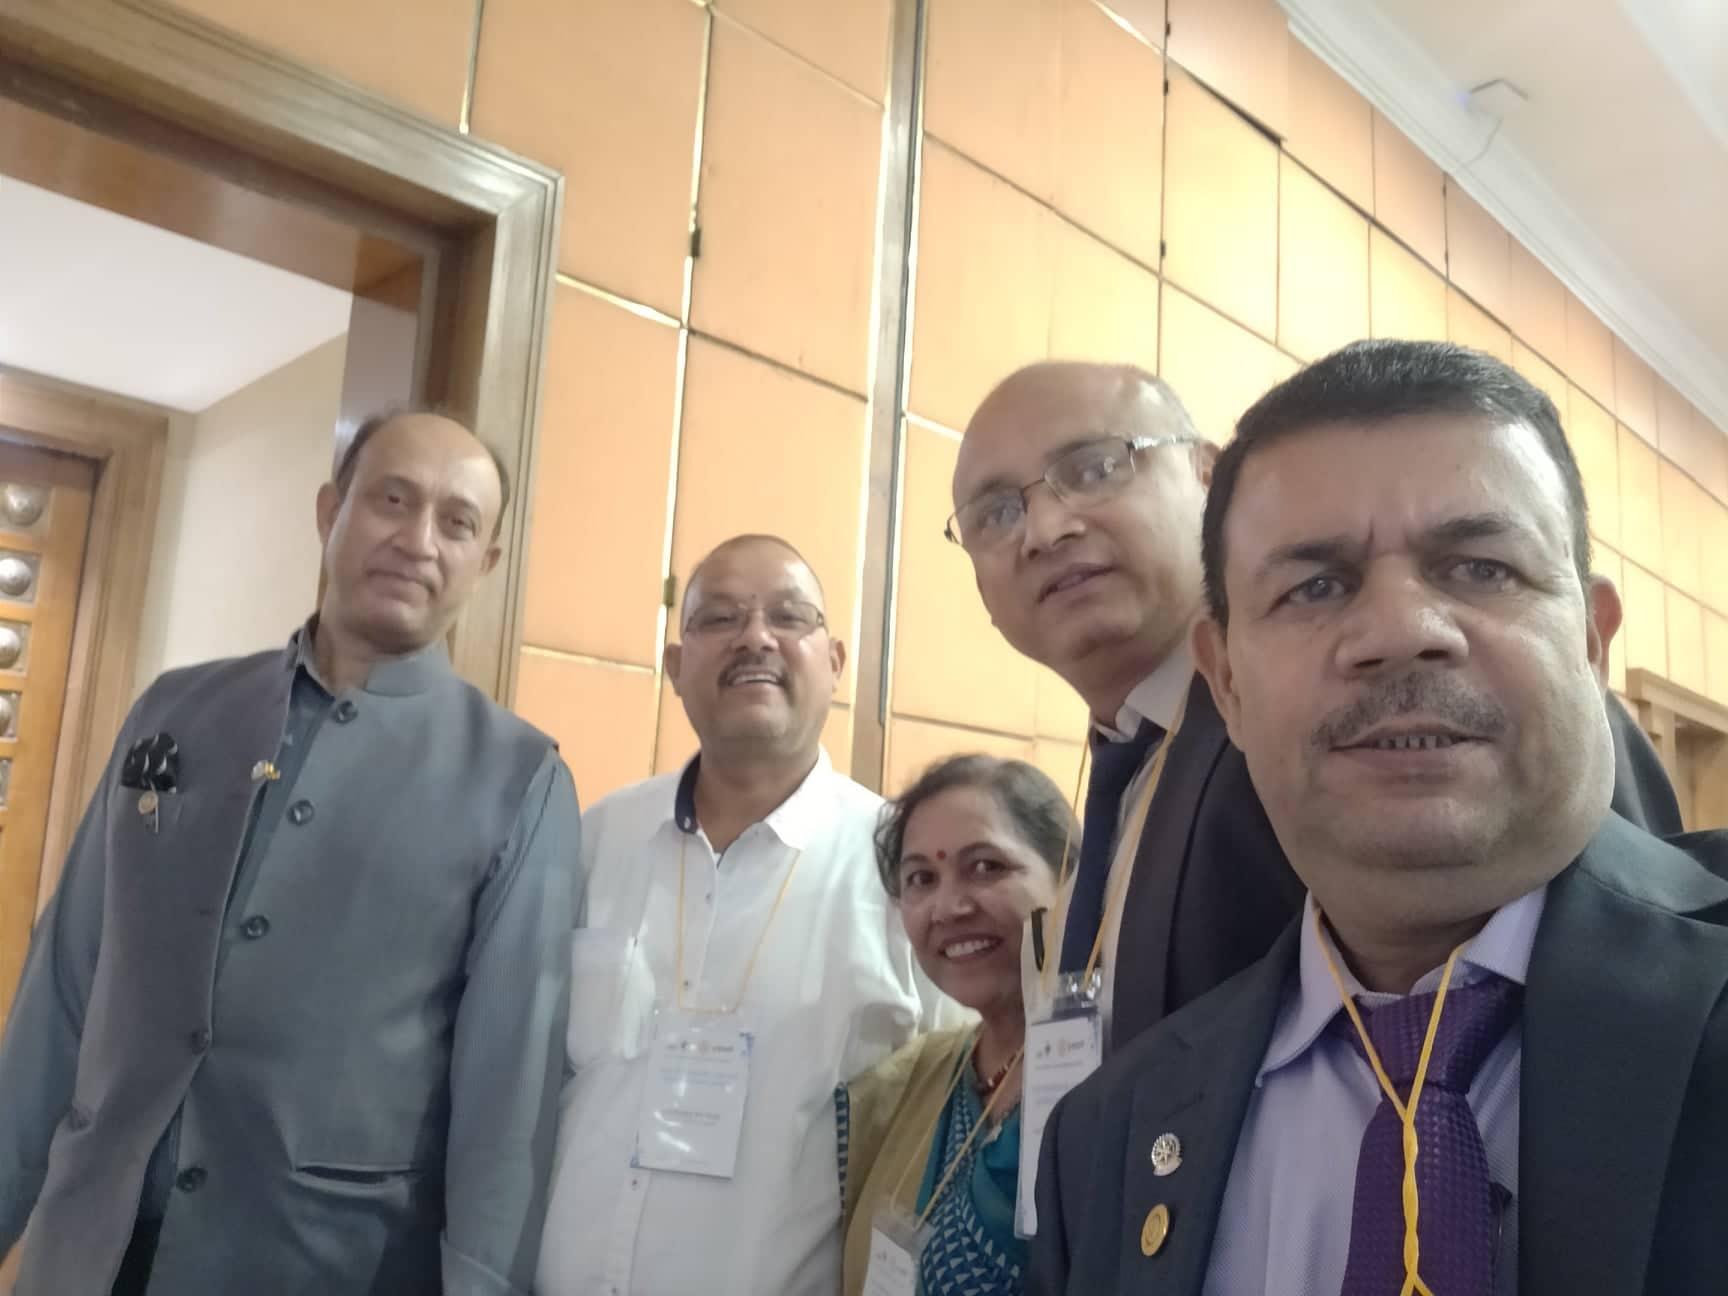 Attended-District-Membership-Public-Image-Seminar-2019-Rotary-Club-of-Kakarvitta-4